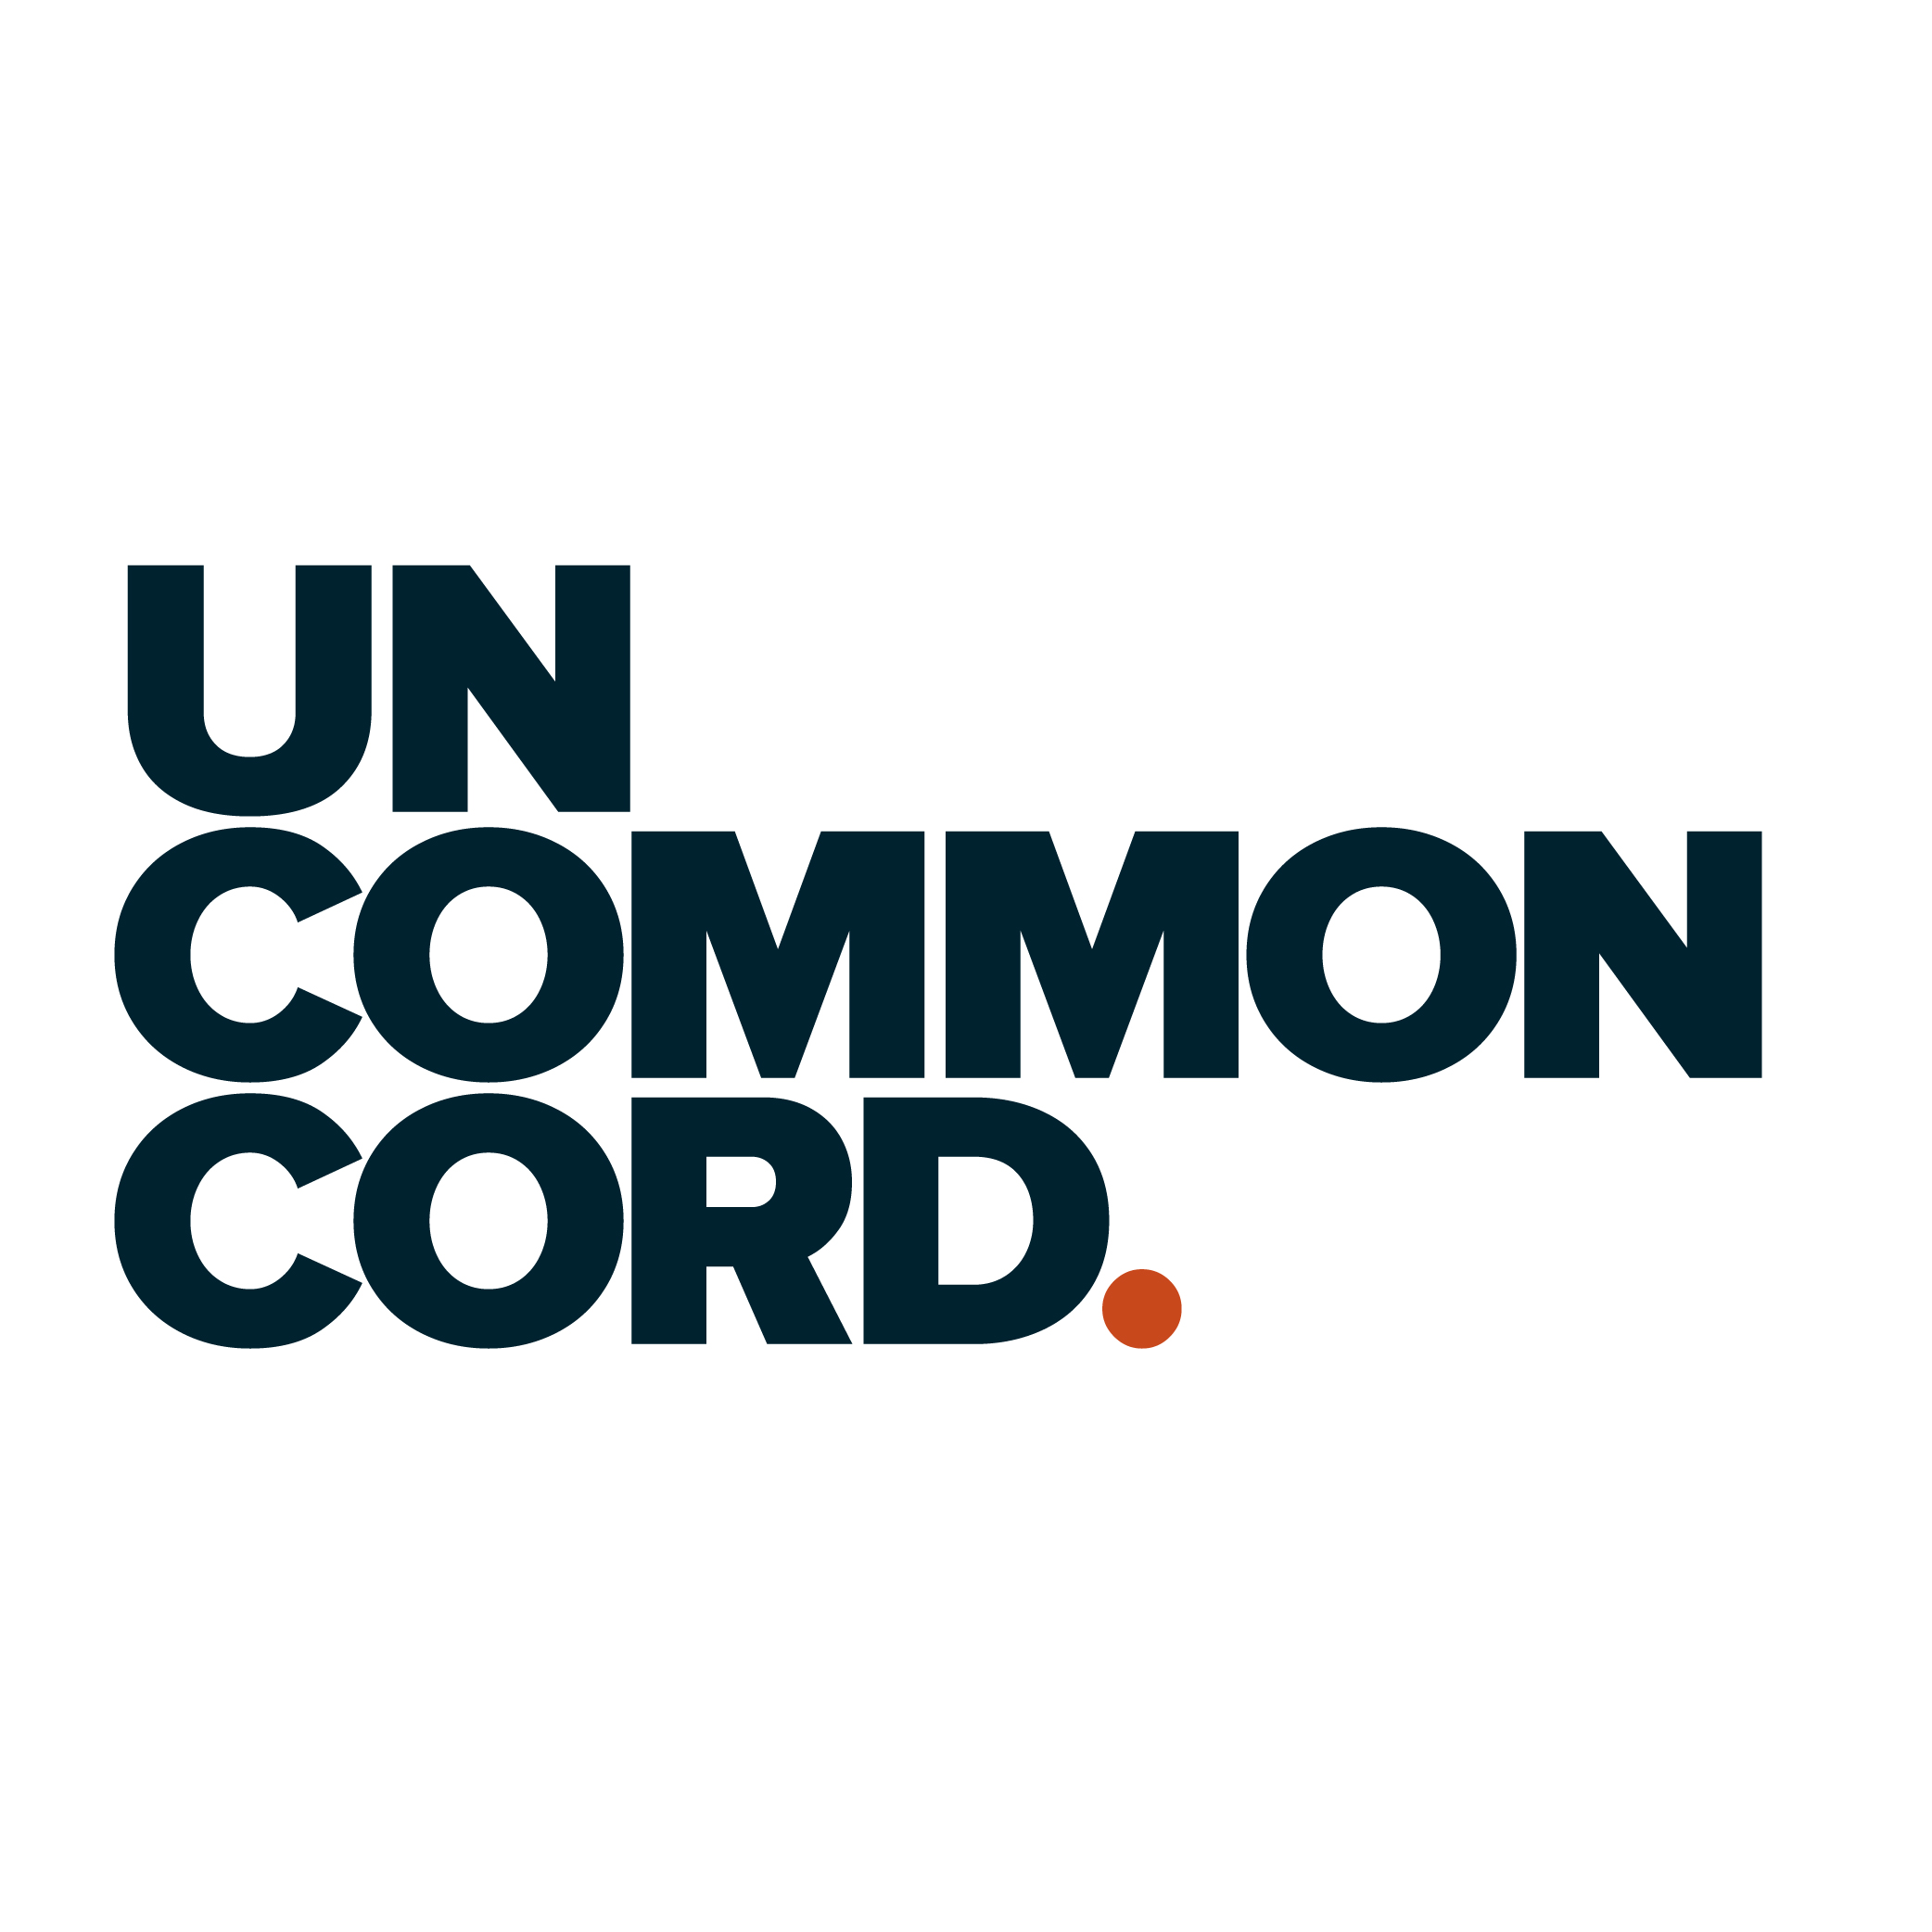 Uncommon Cord Logo-01.jpg